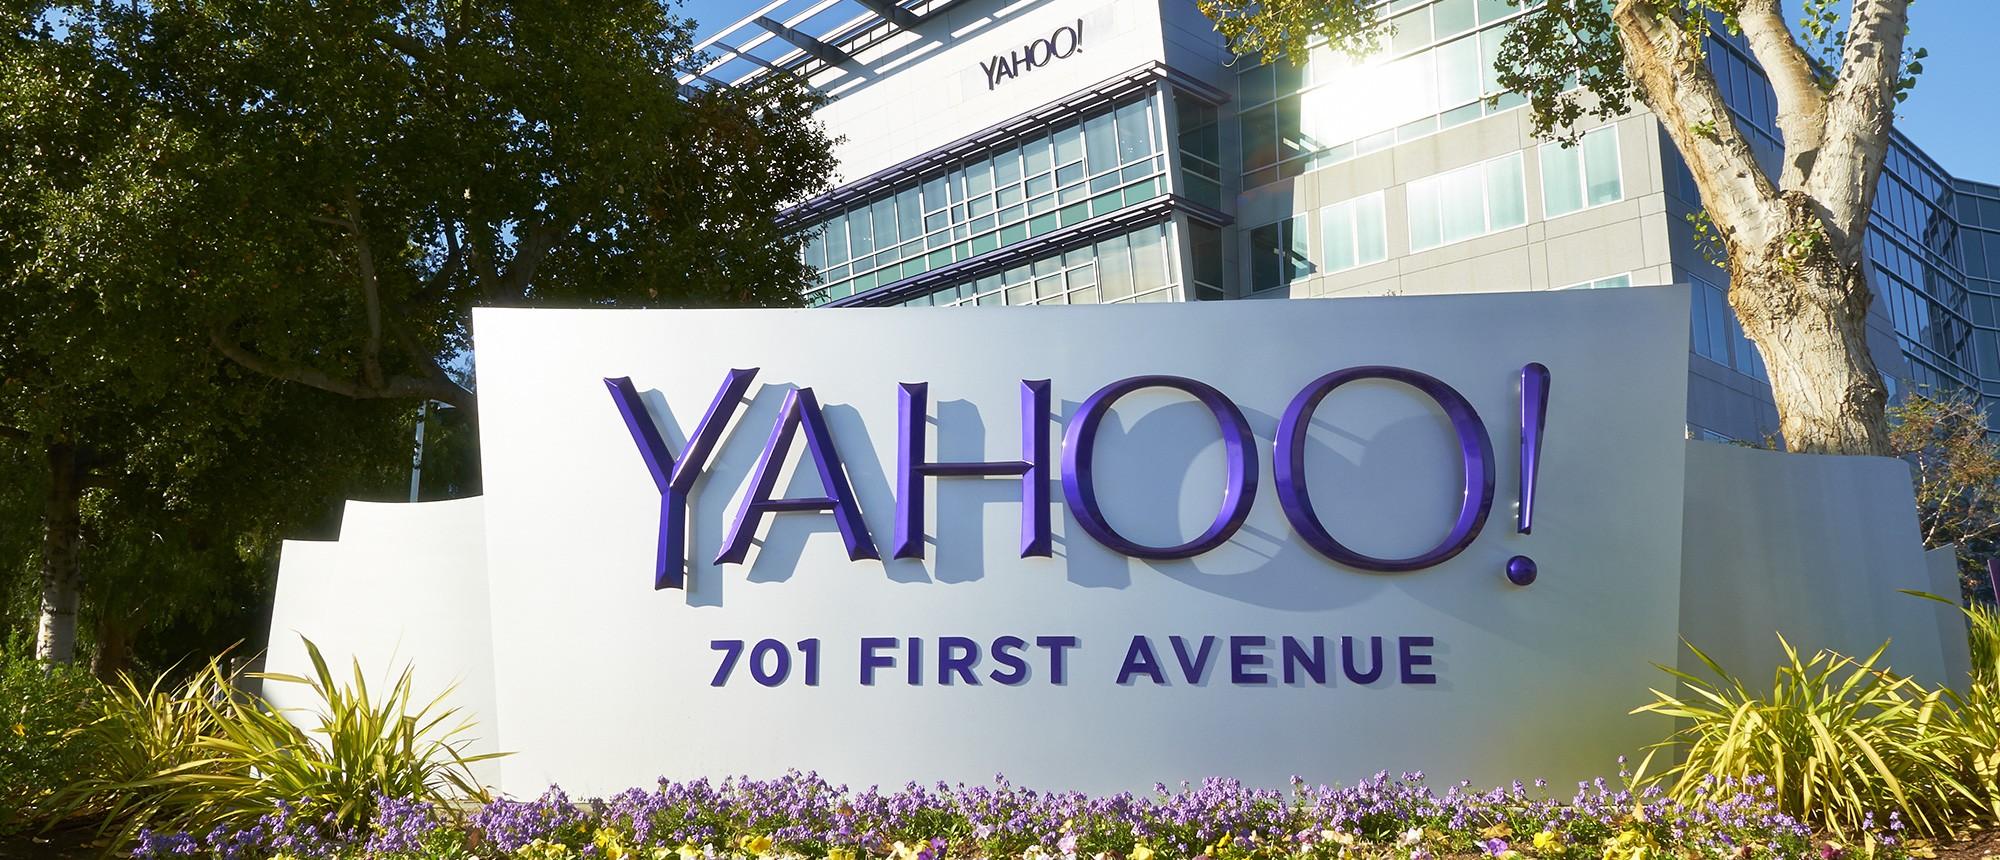 SEC Preparing Probe into Yahoo Over Hacks